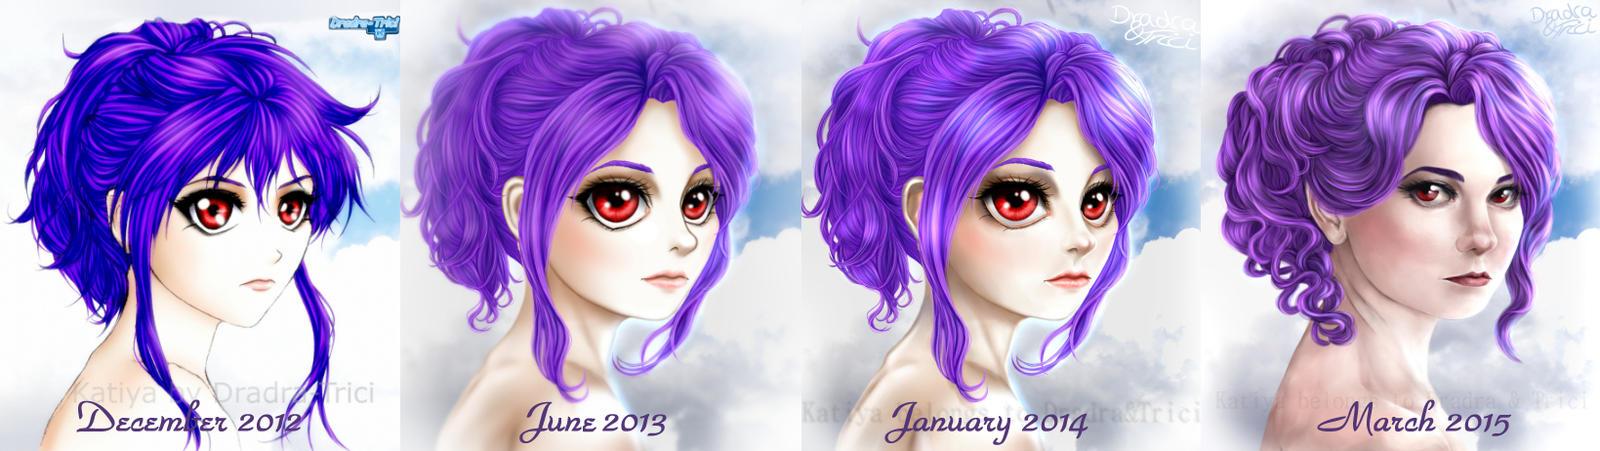 Katiya's face - Timeline by Dradra-Trici